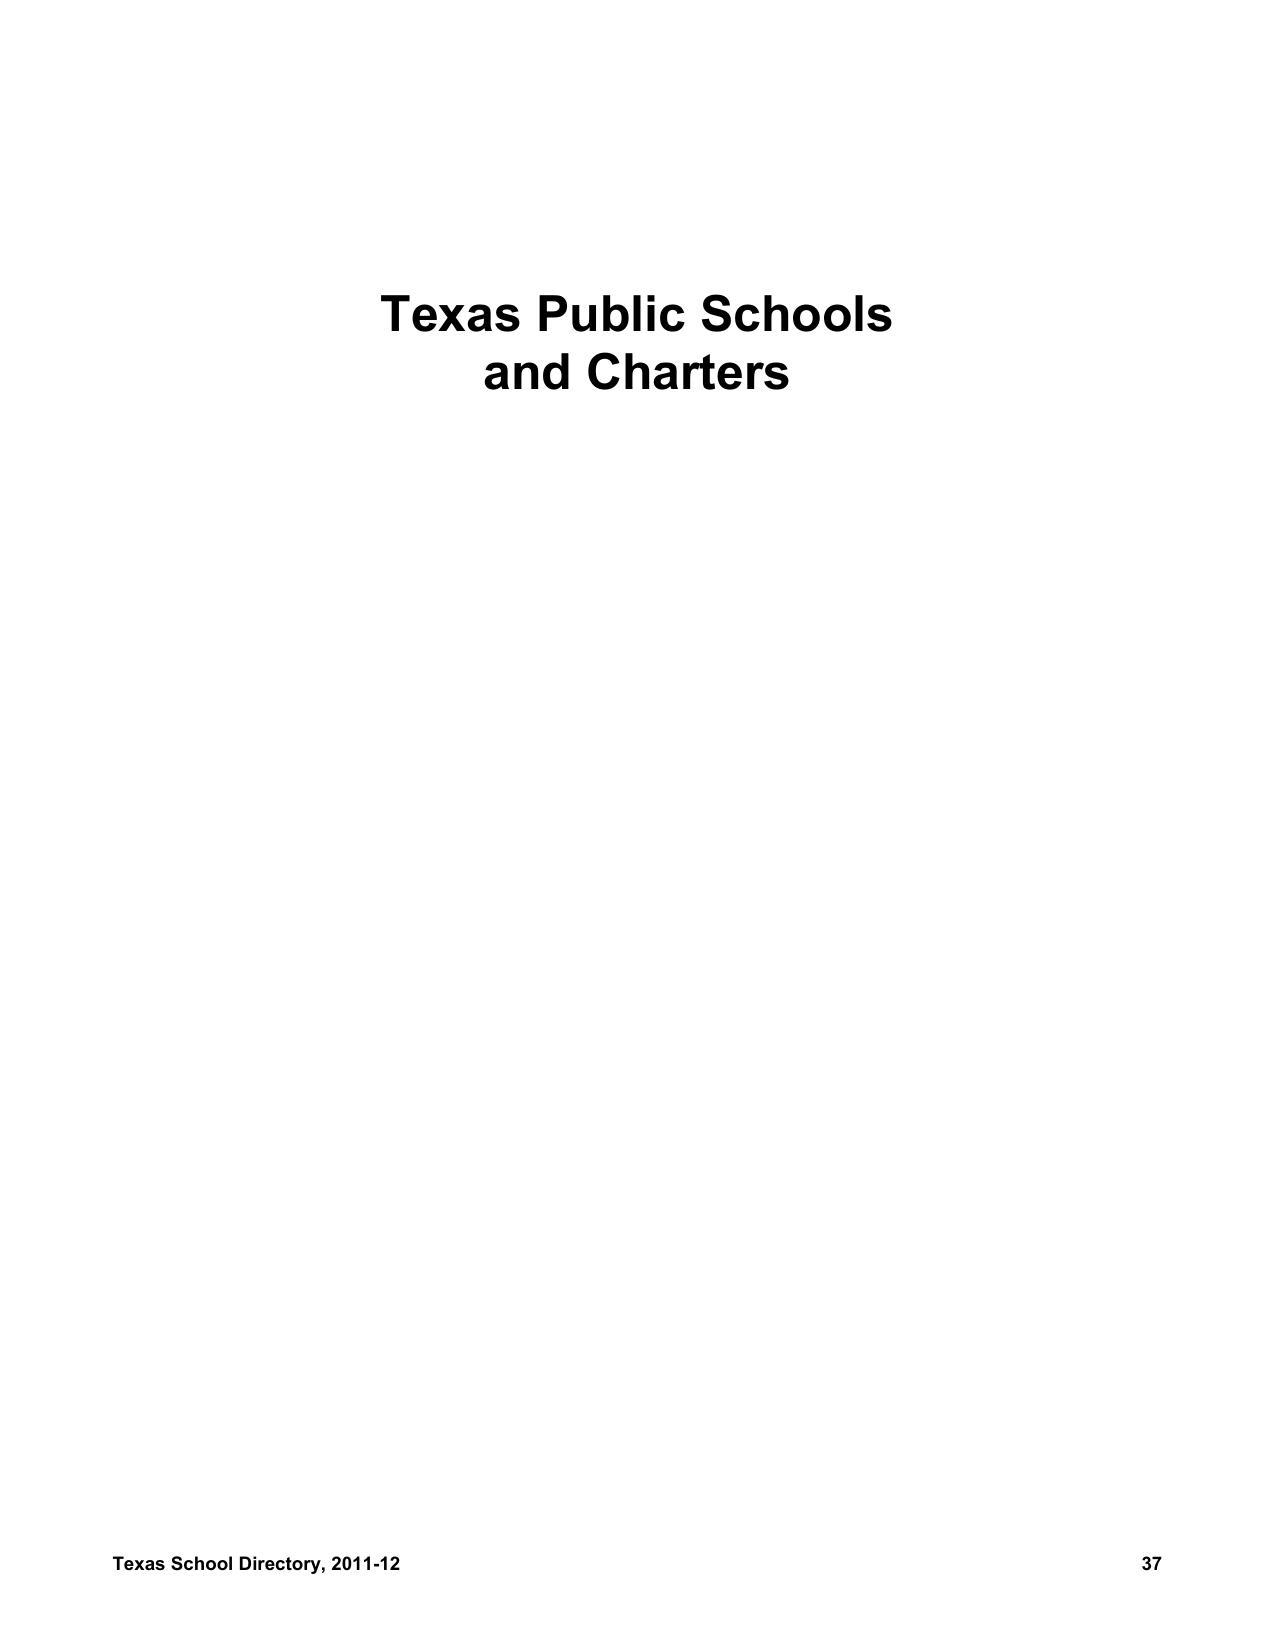 Texas Public Schools And Charters School Directory 2011 12